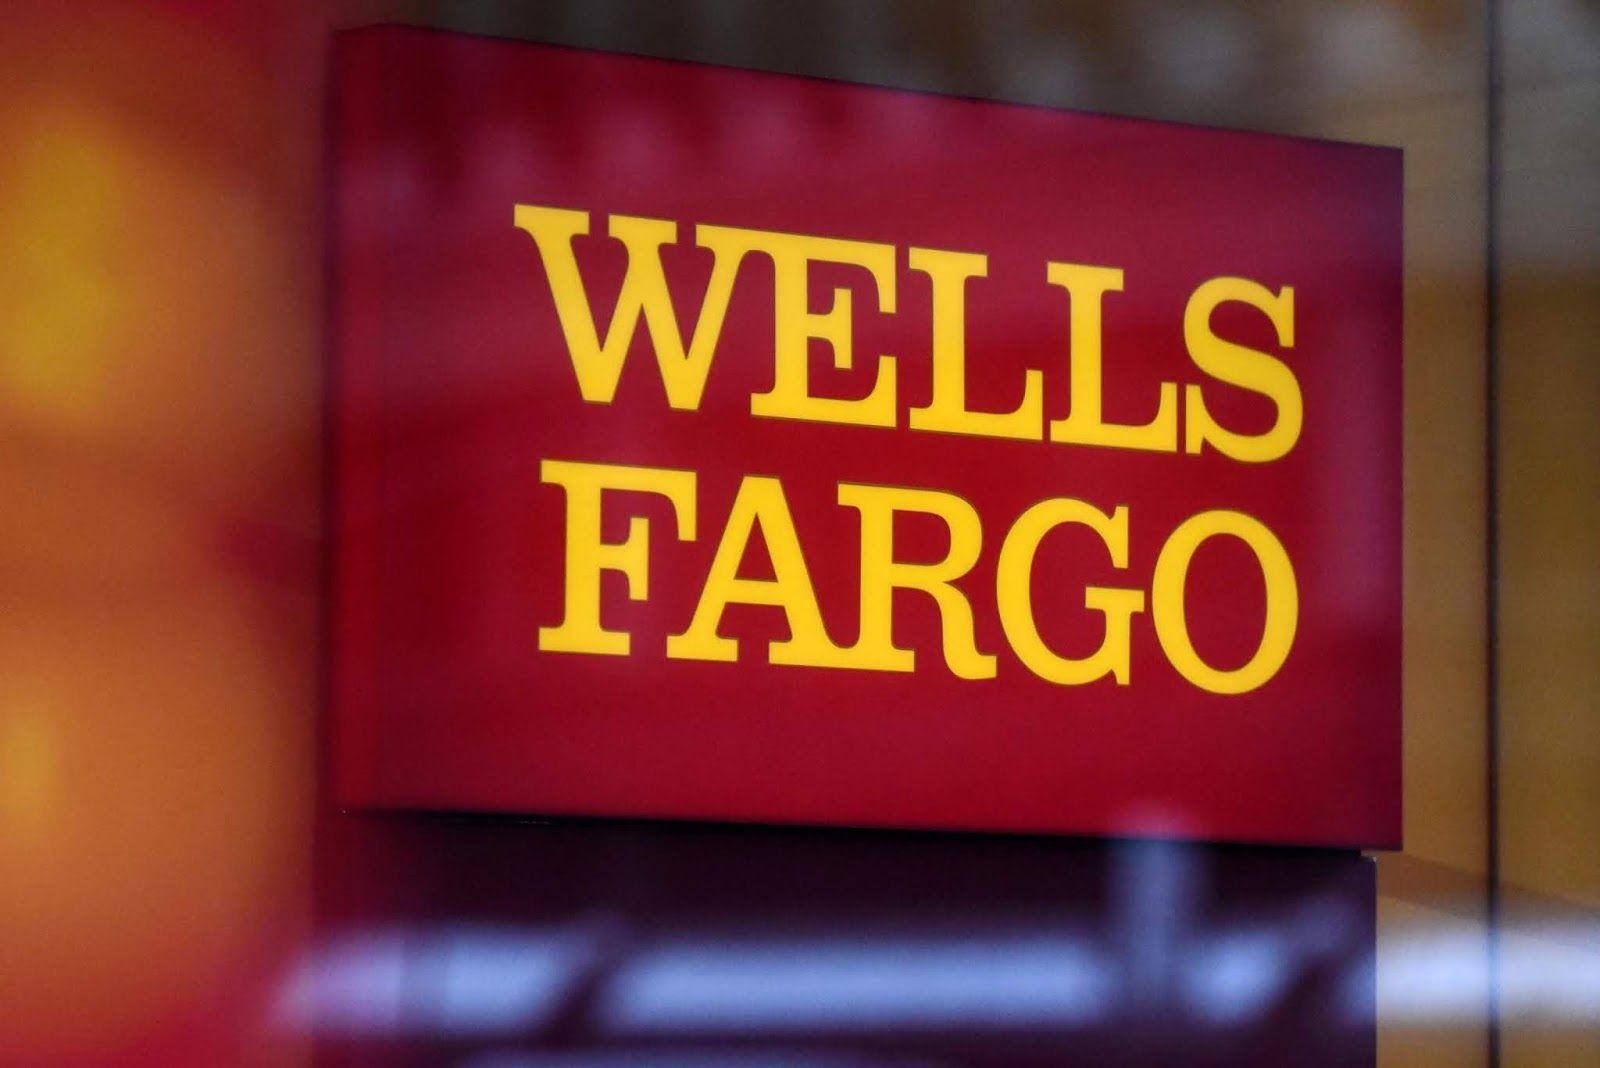 Wells Fargo Says Auto Insurance Remediation Will Not Wrap